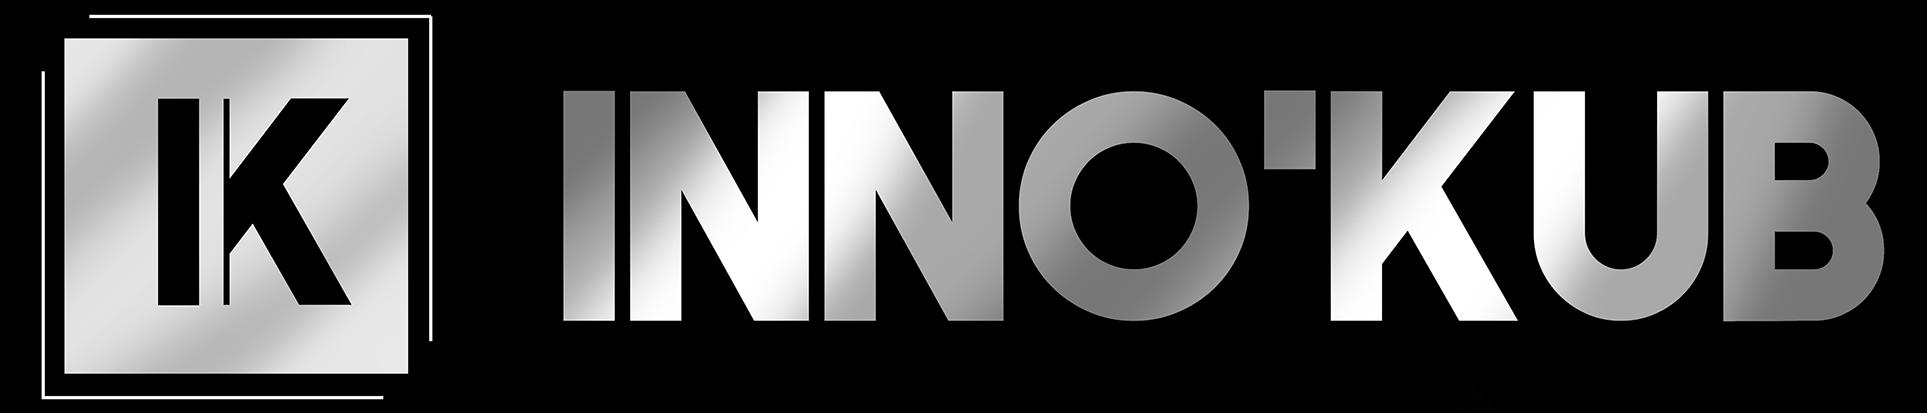 Inno'kub